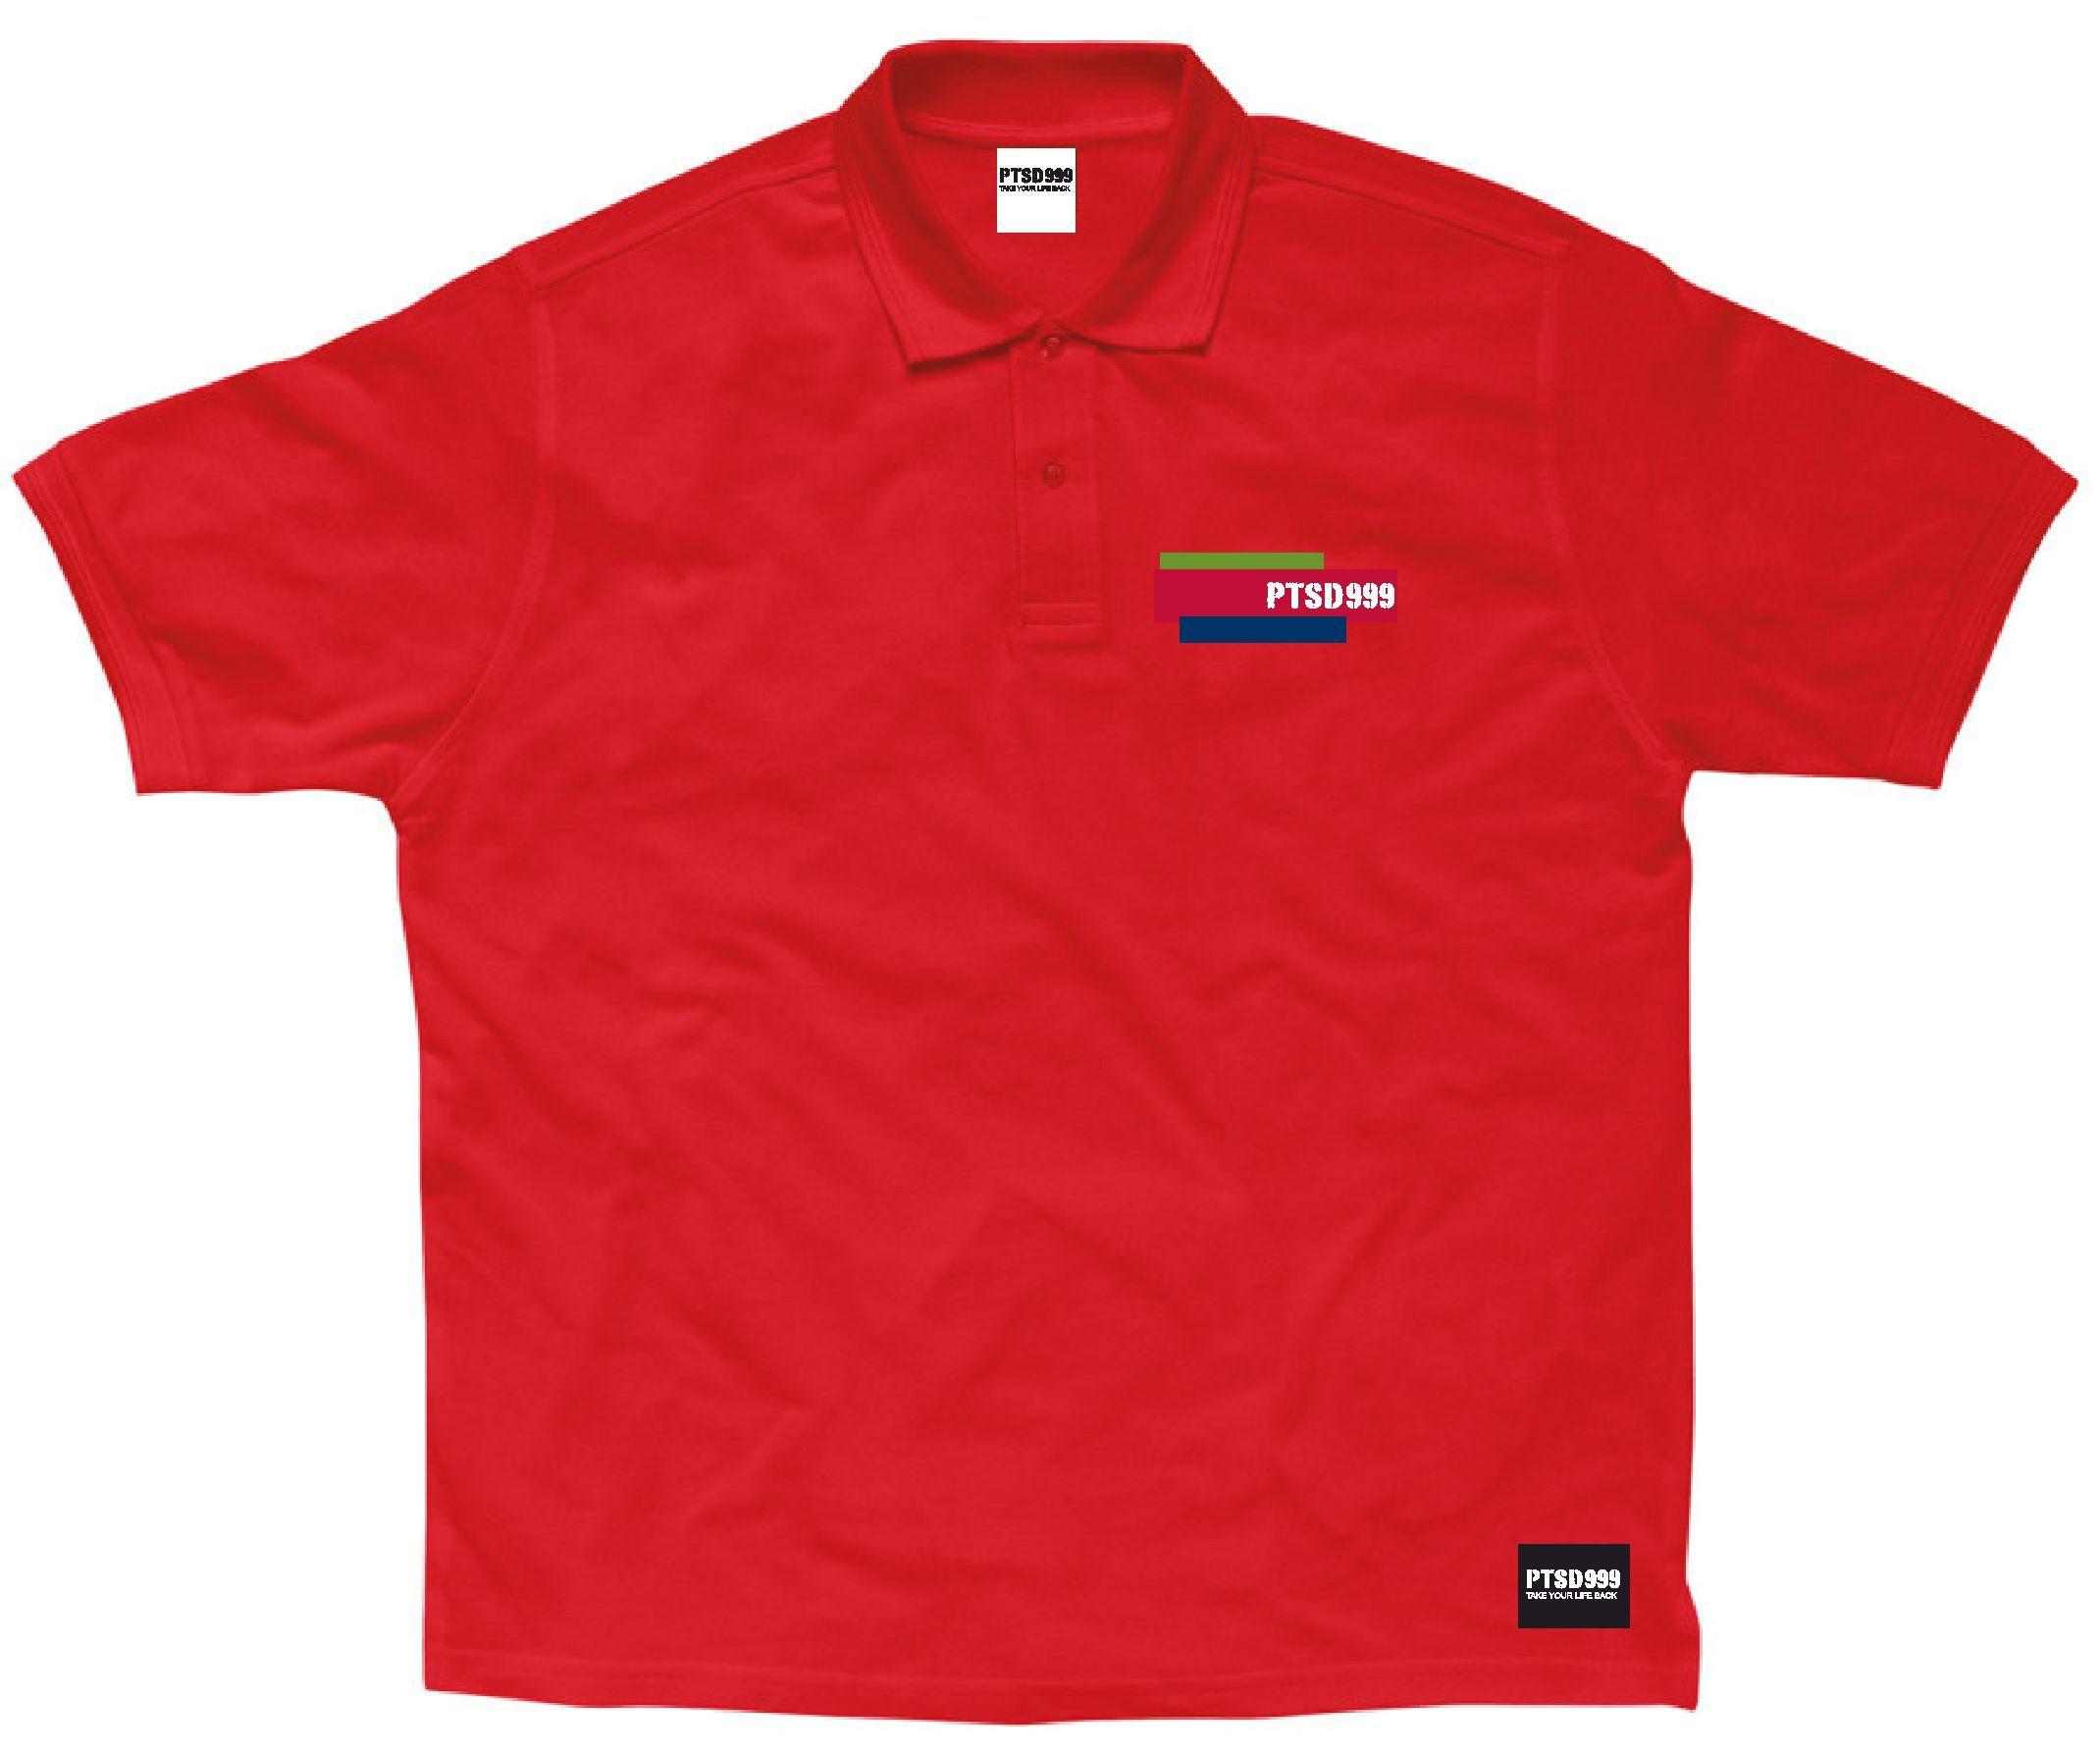 PTSD999- Original Polo Shirt (Kids)